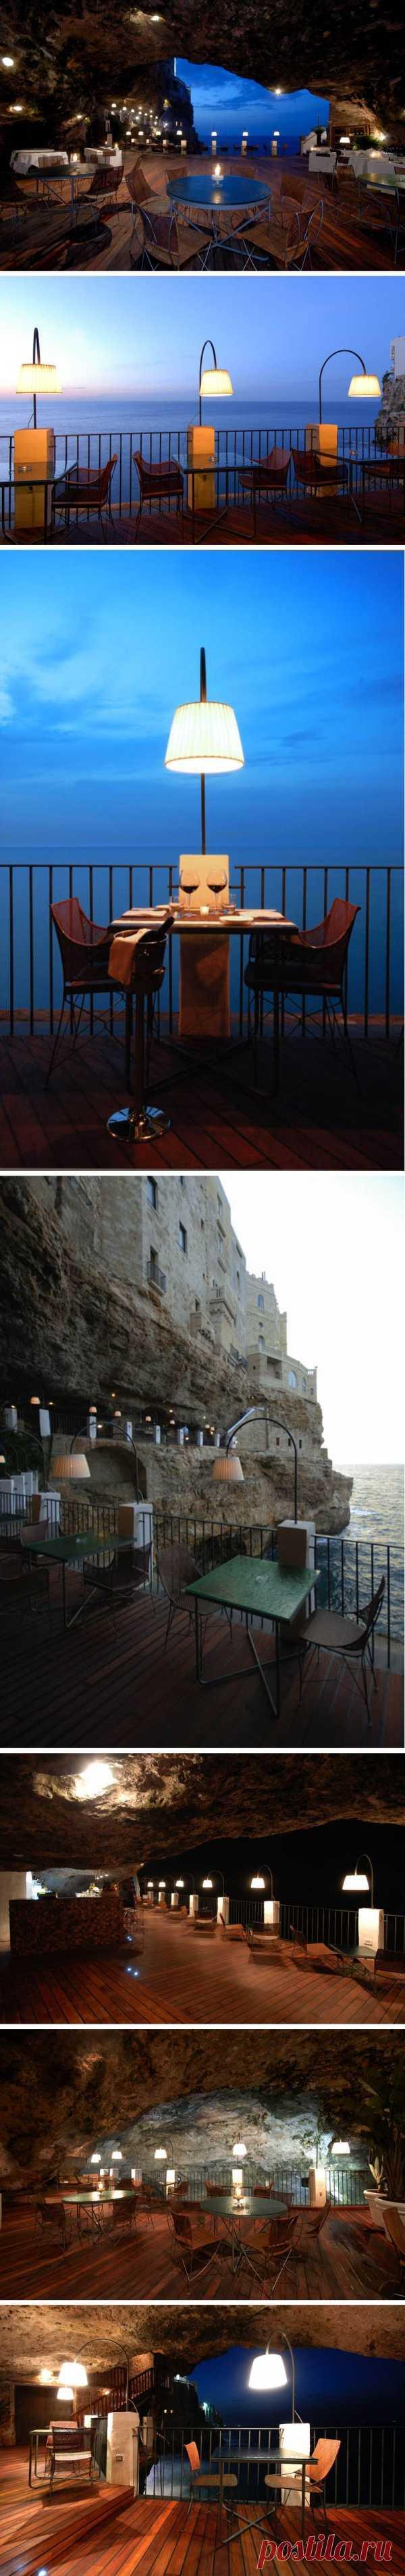 Ресторан в пещере с видом на море! Полиньяно-а-Маре, Италия